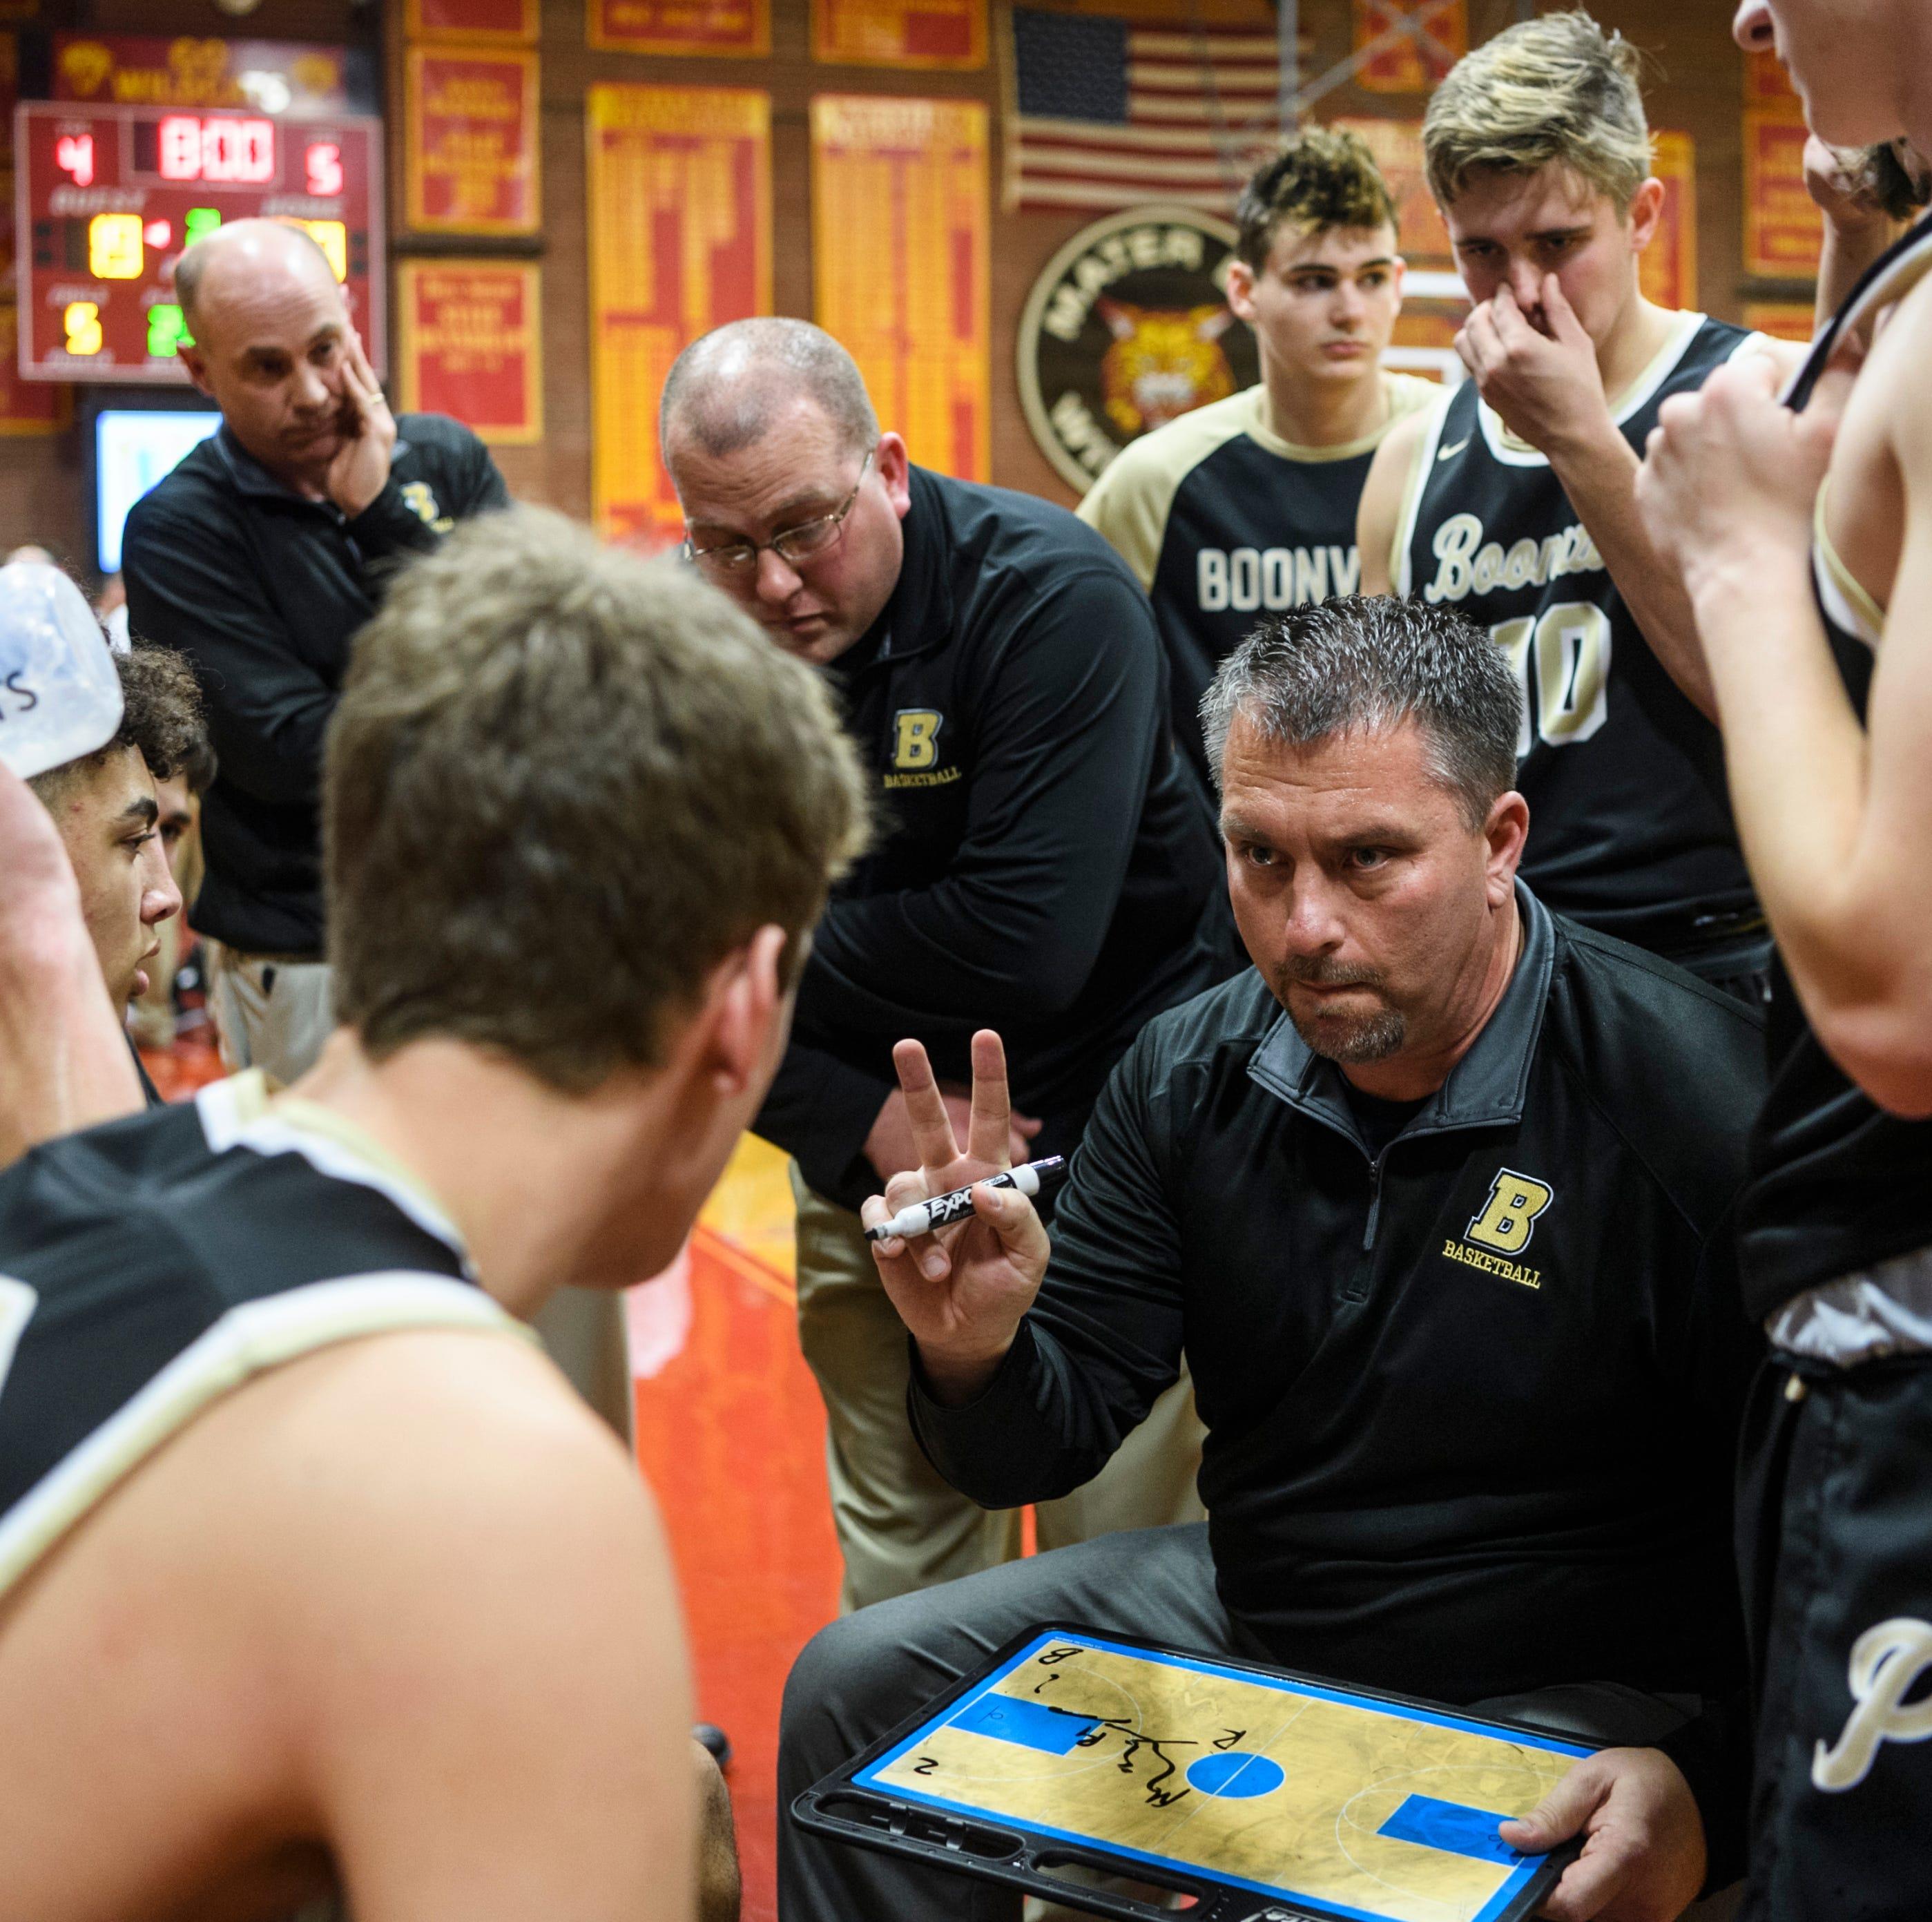 Brian Schoonover steps down as Boonville boys basketball coach